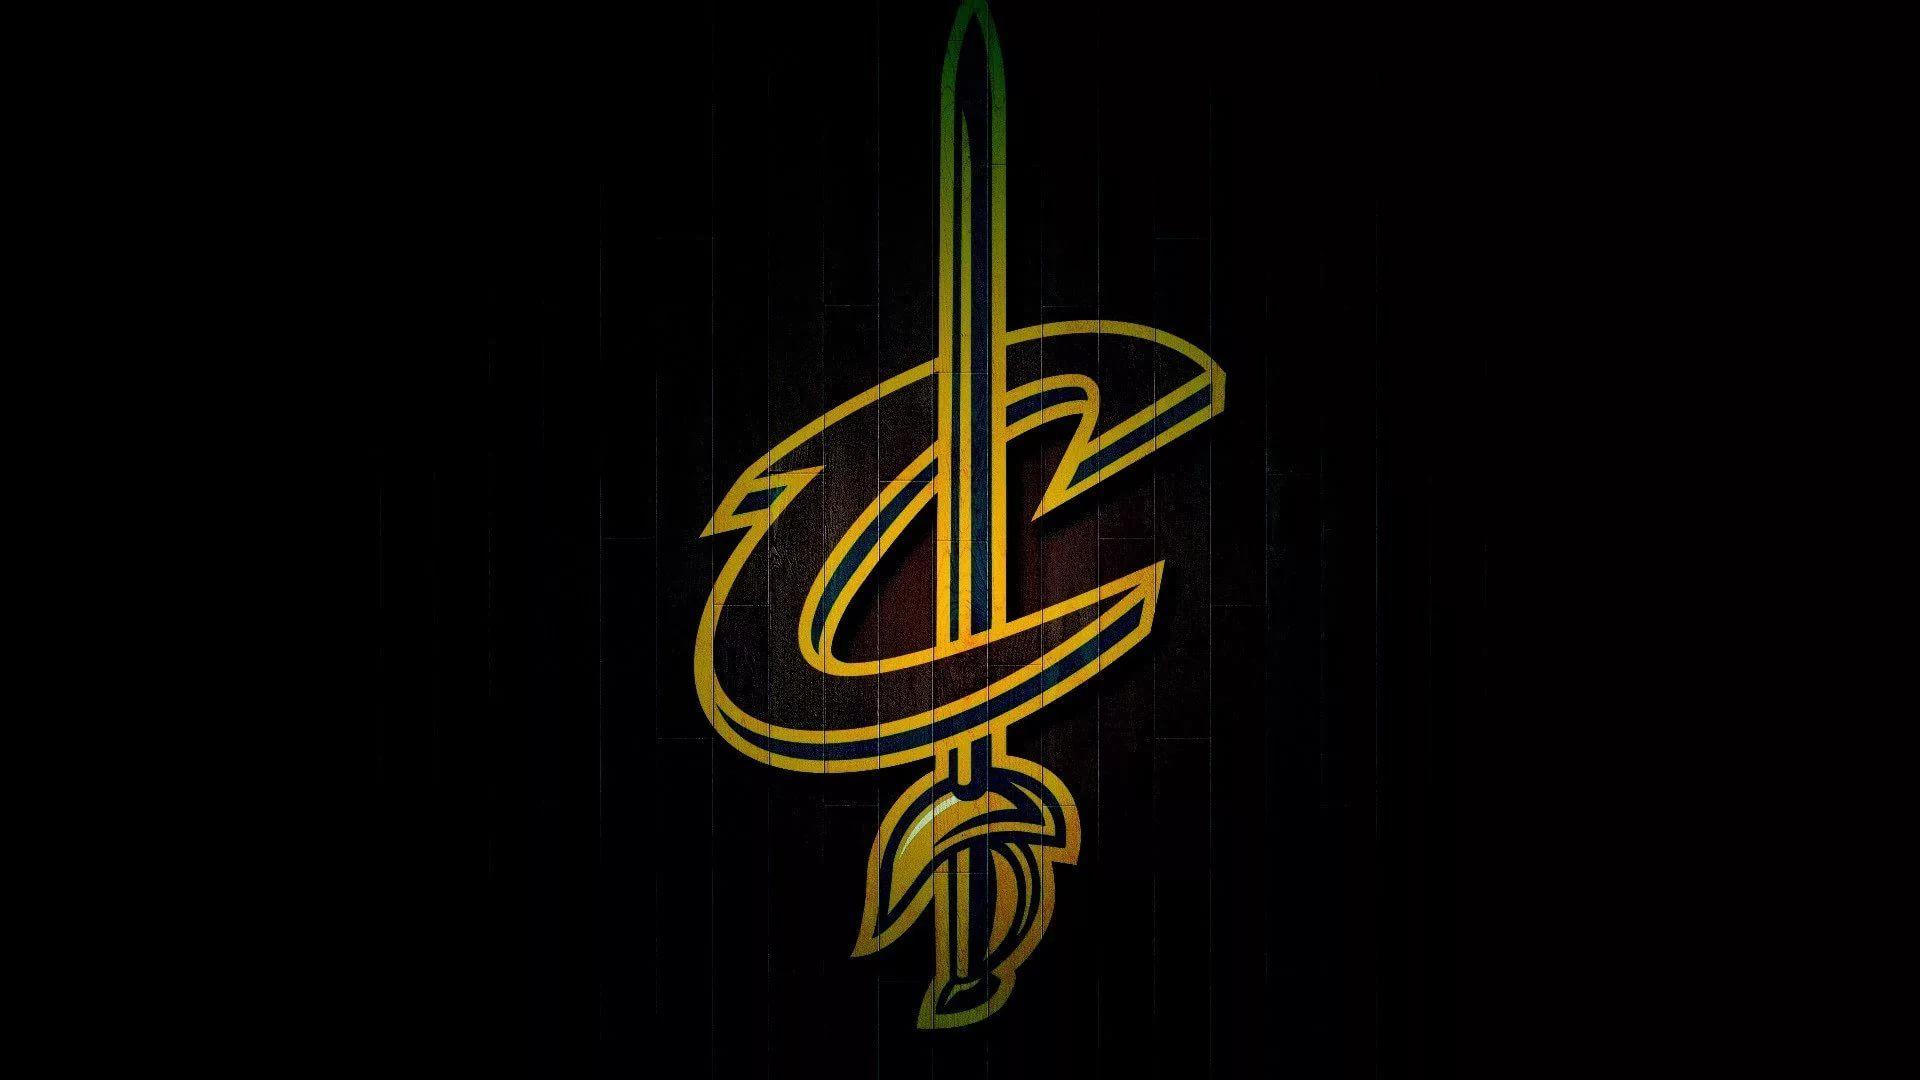 Cleveland PC Wallpaper HD